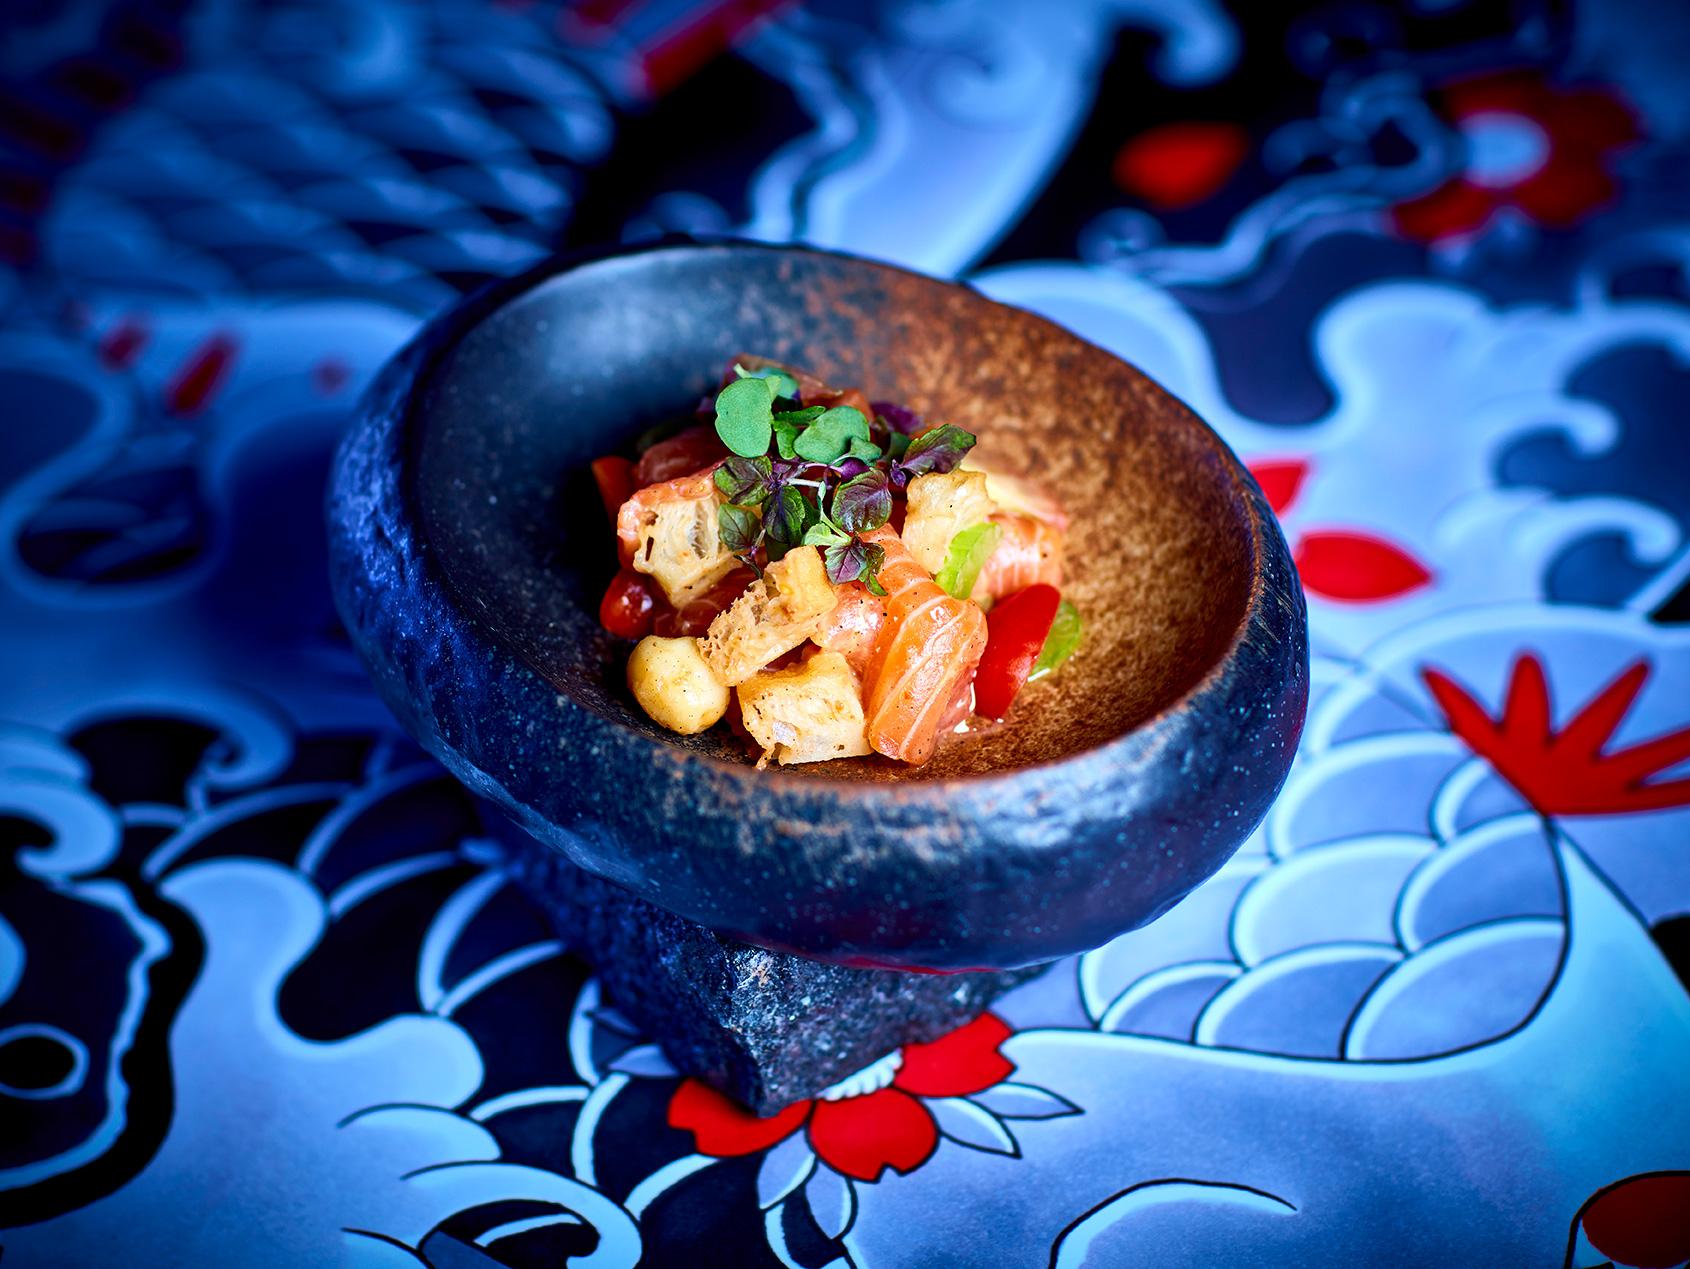 STAR2053-Chuuka-Chefs-14051911353-RGB-HR.jpg